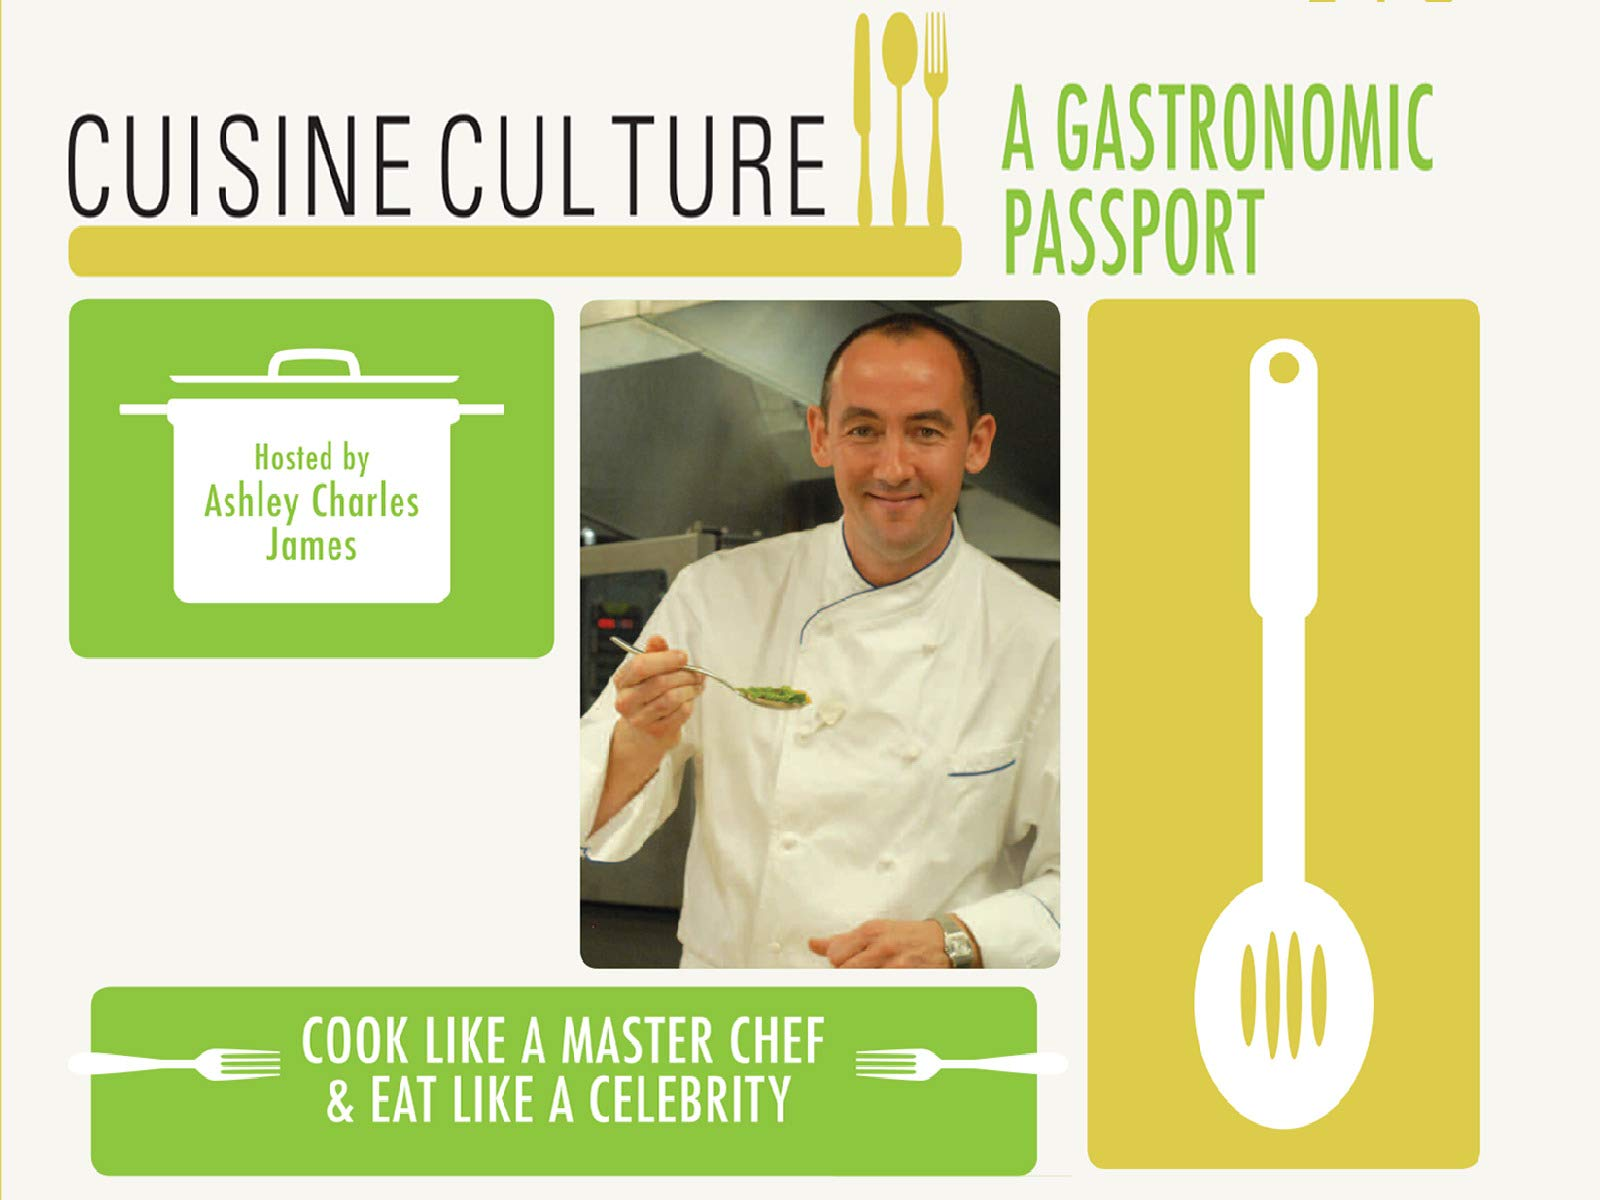 Cuisine Culture